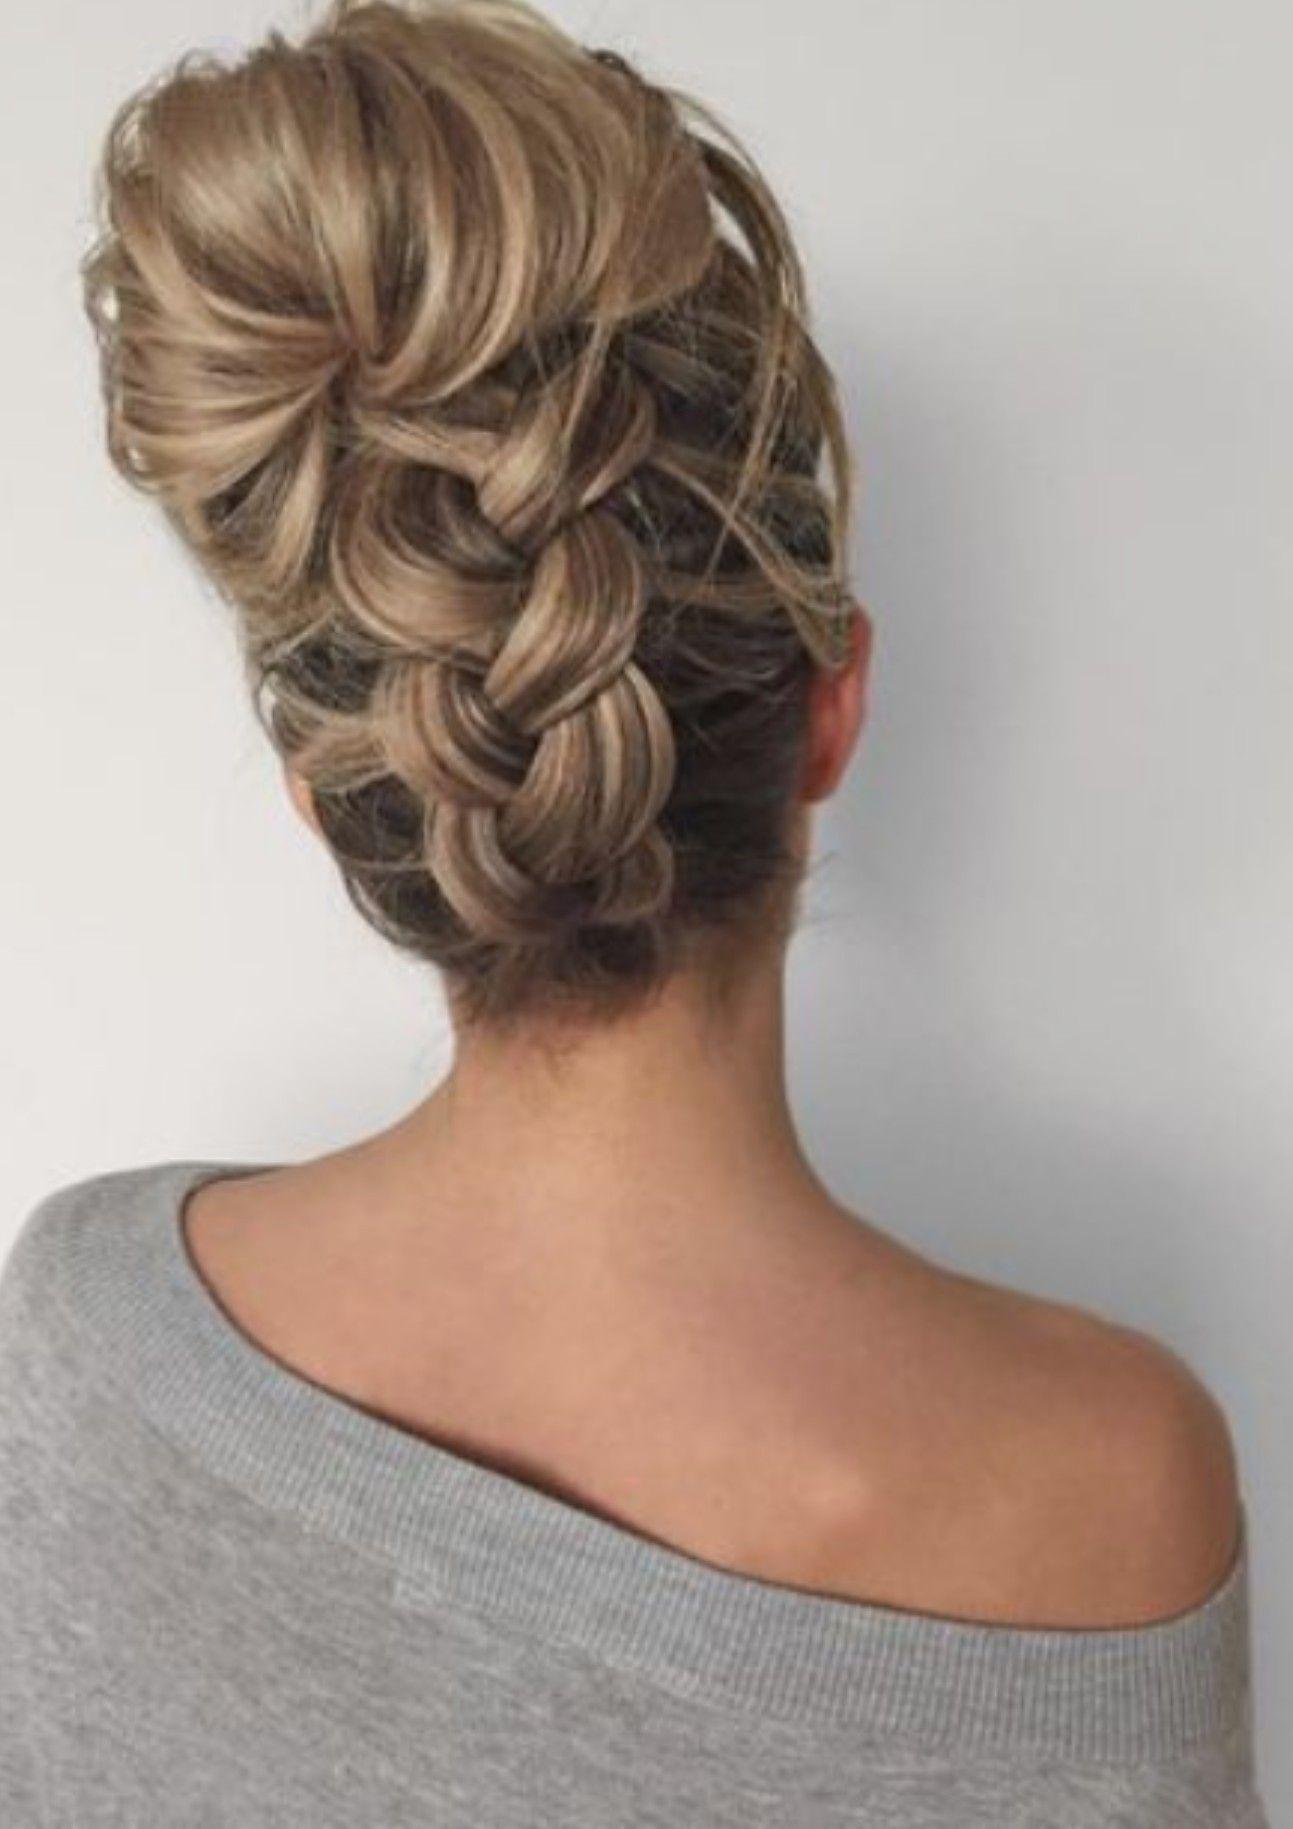 Pin by sherri tyler on makeuphairnailsuc pinterest hair